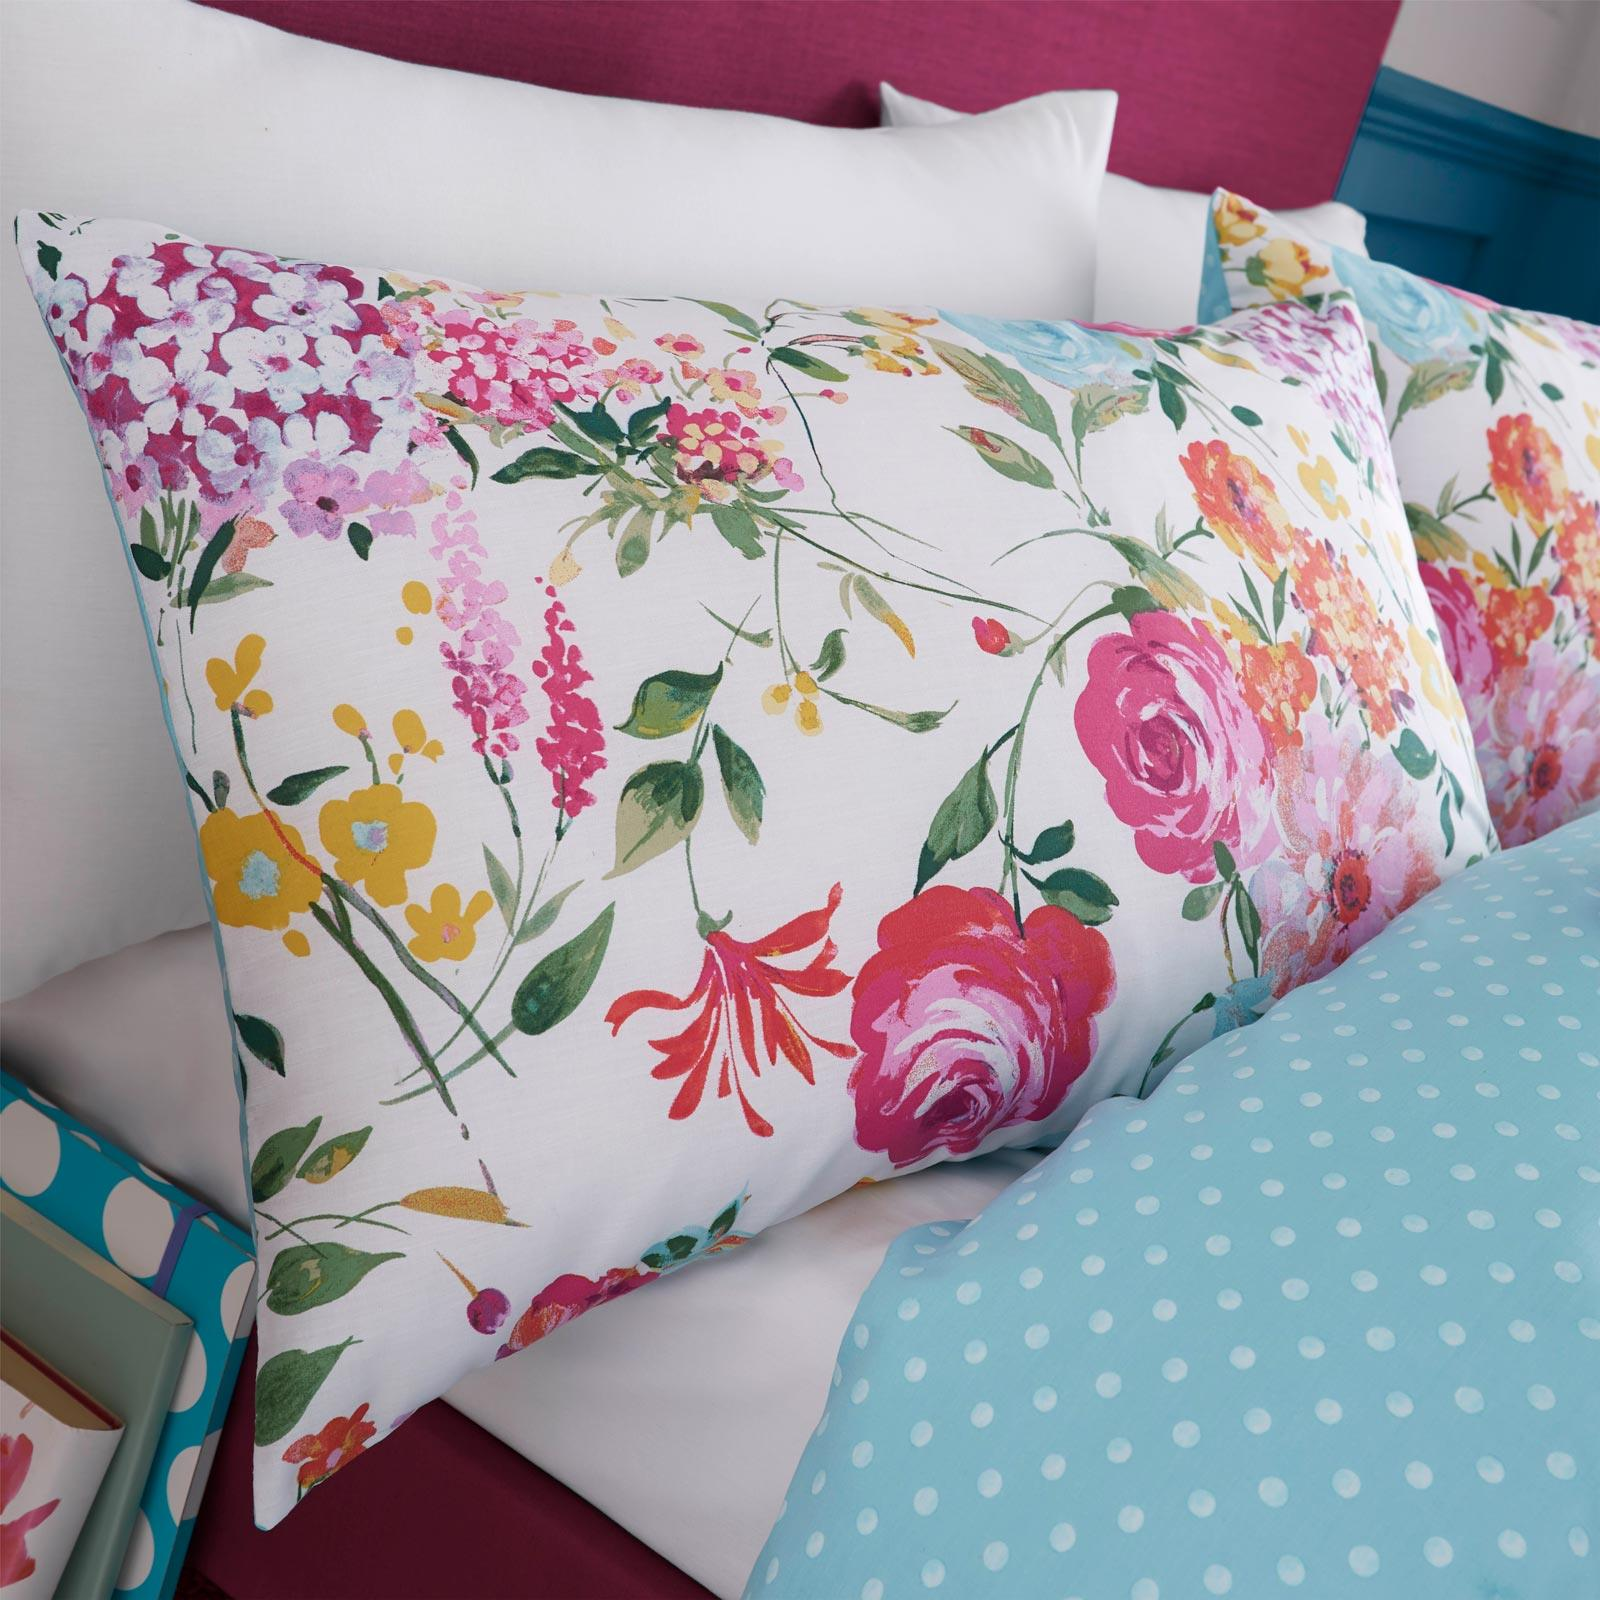 Catherine-Lansfield-Salisbury-Pink-cubierta-del-edredon-edredon-cubre-floral-de-conjuntos-de-cama miniatura 14